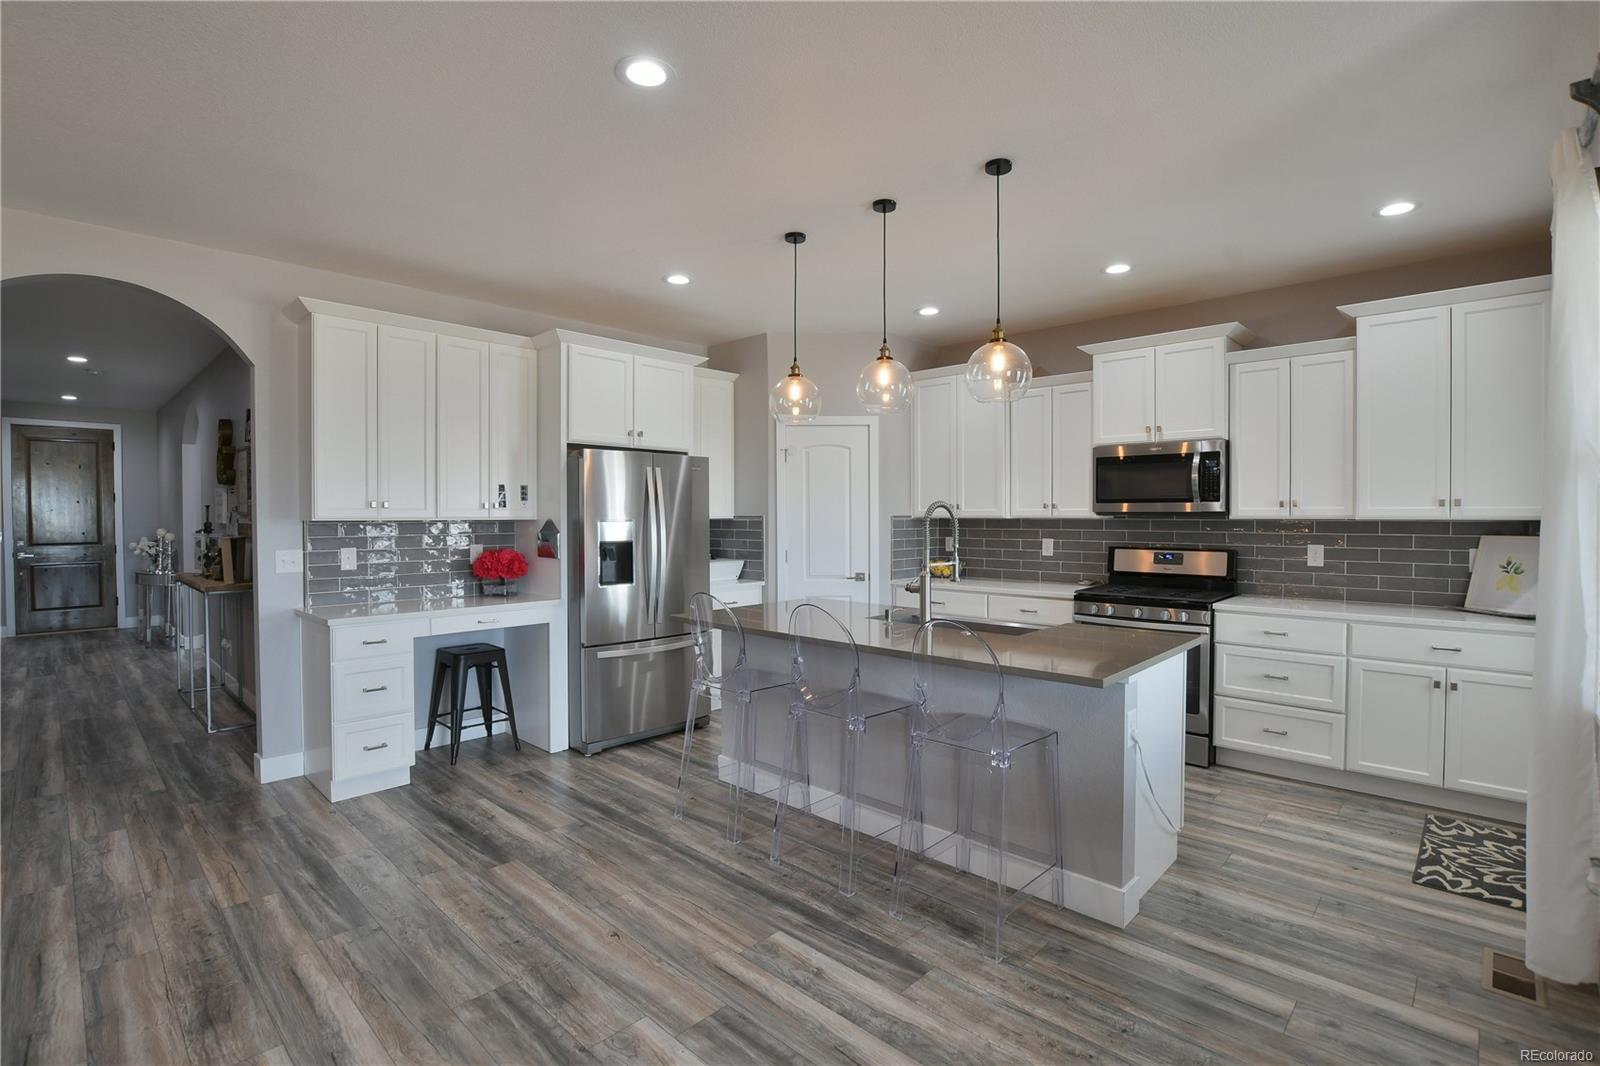 Quartz counters, farm sink, stainless appliances, recessed lighting